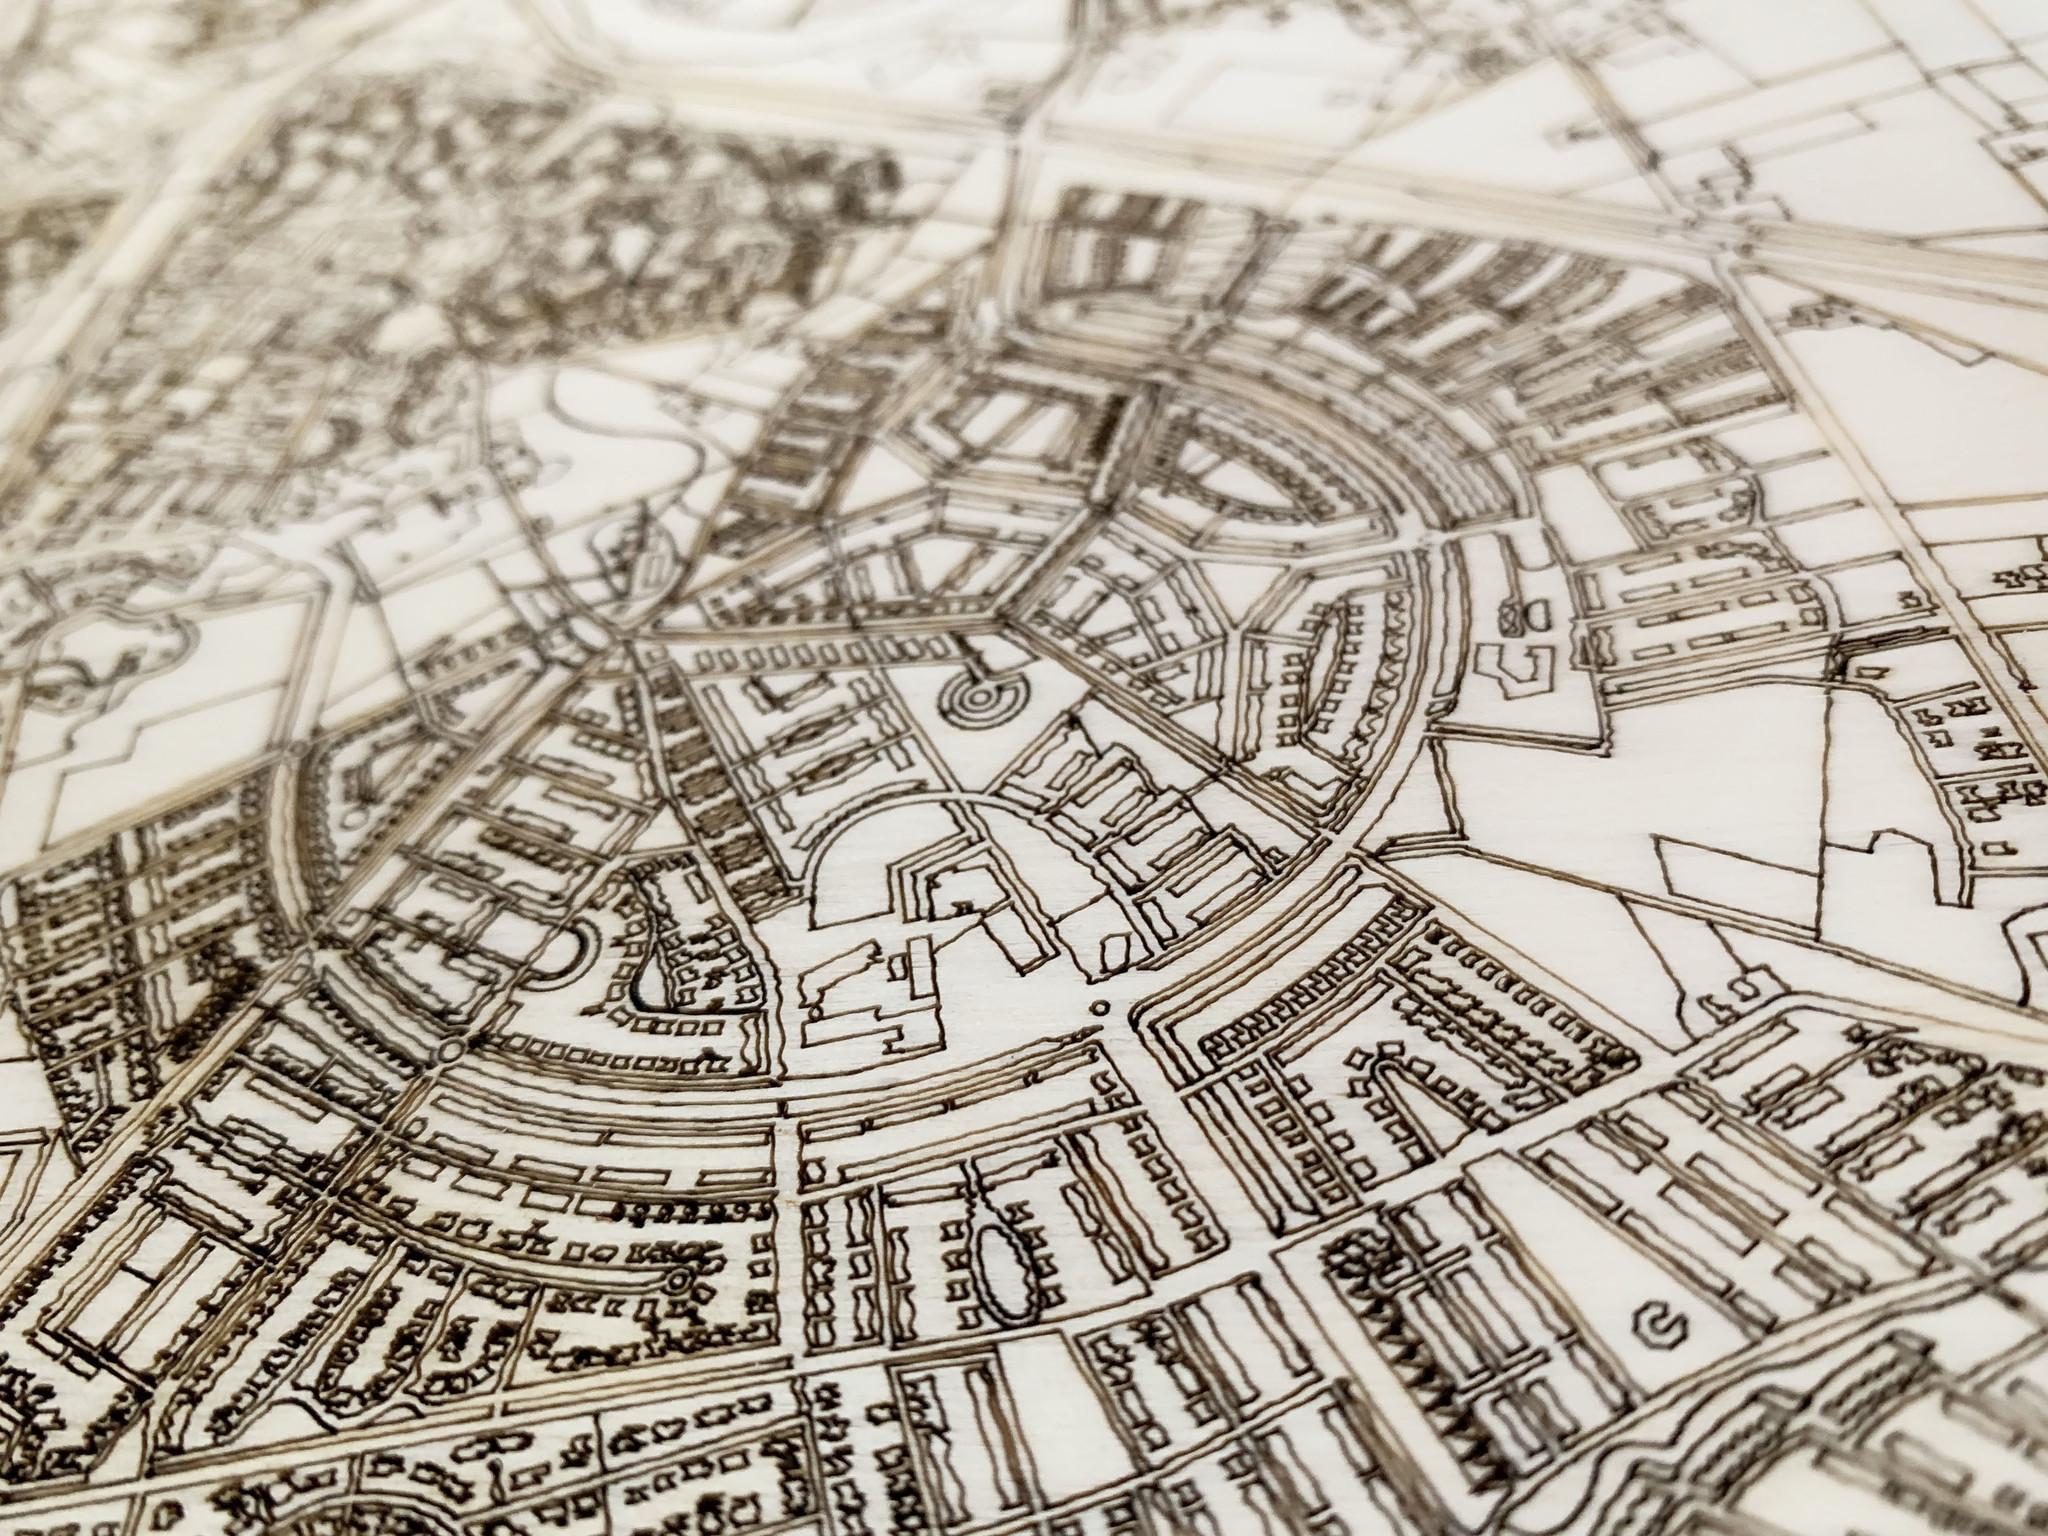 Houten stadsplattegrond Rijnsburg-3